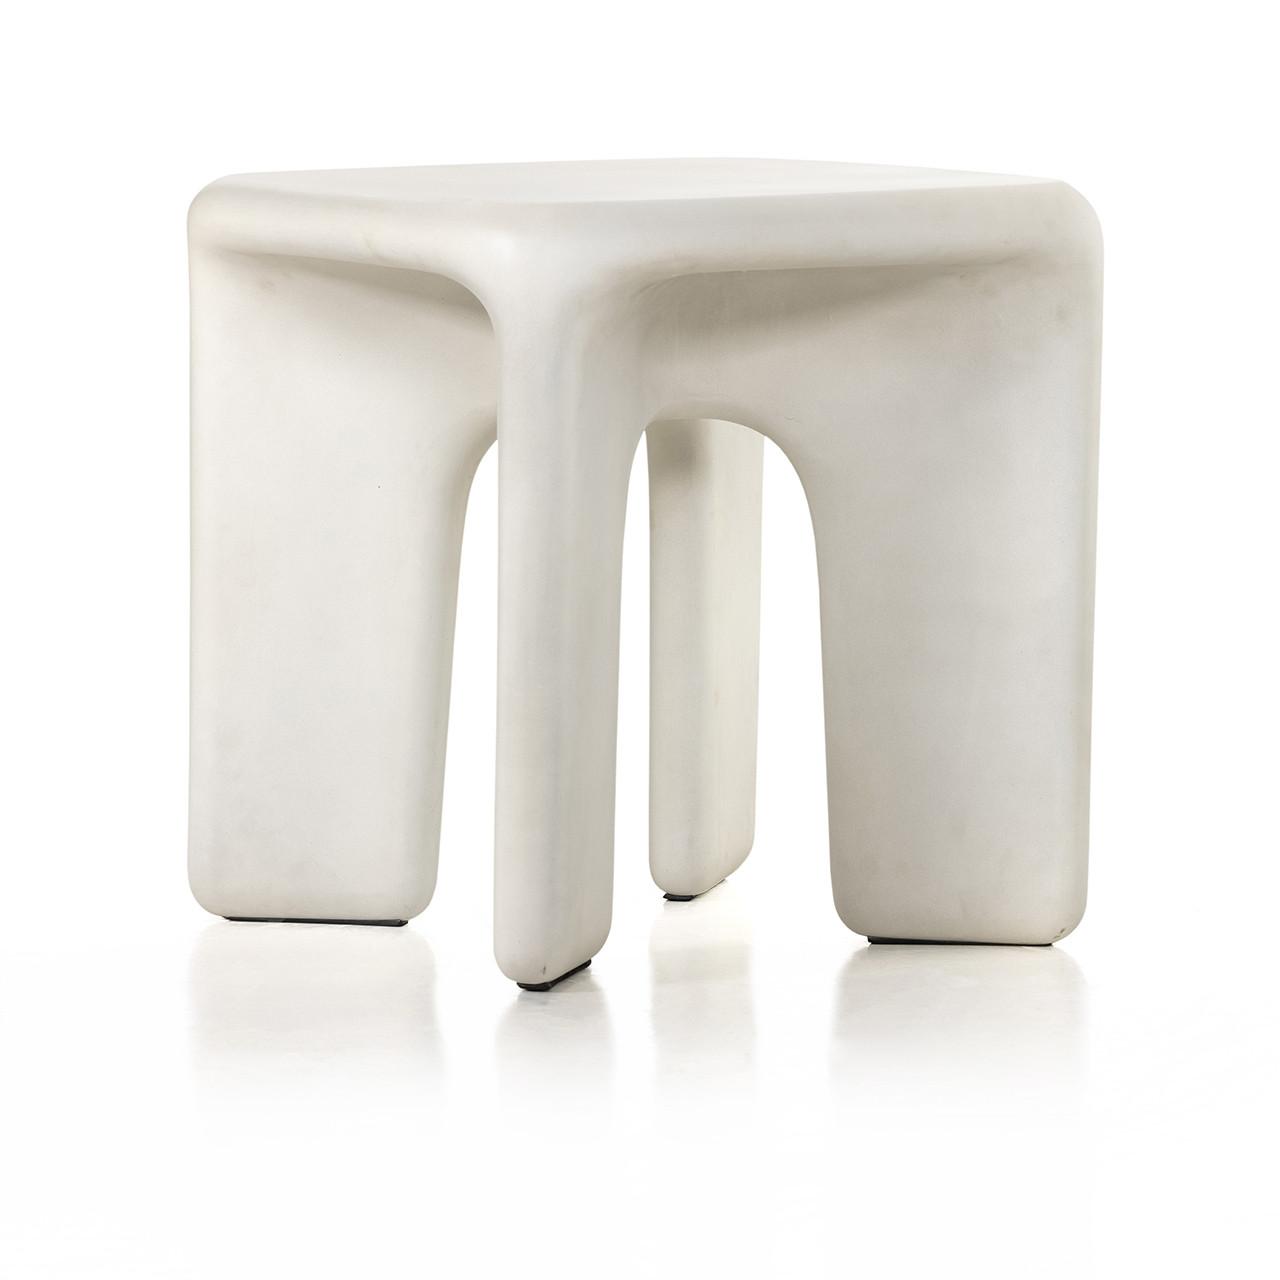 Dea End Table - White Concrete